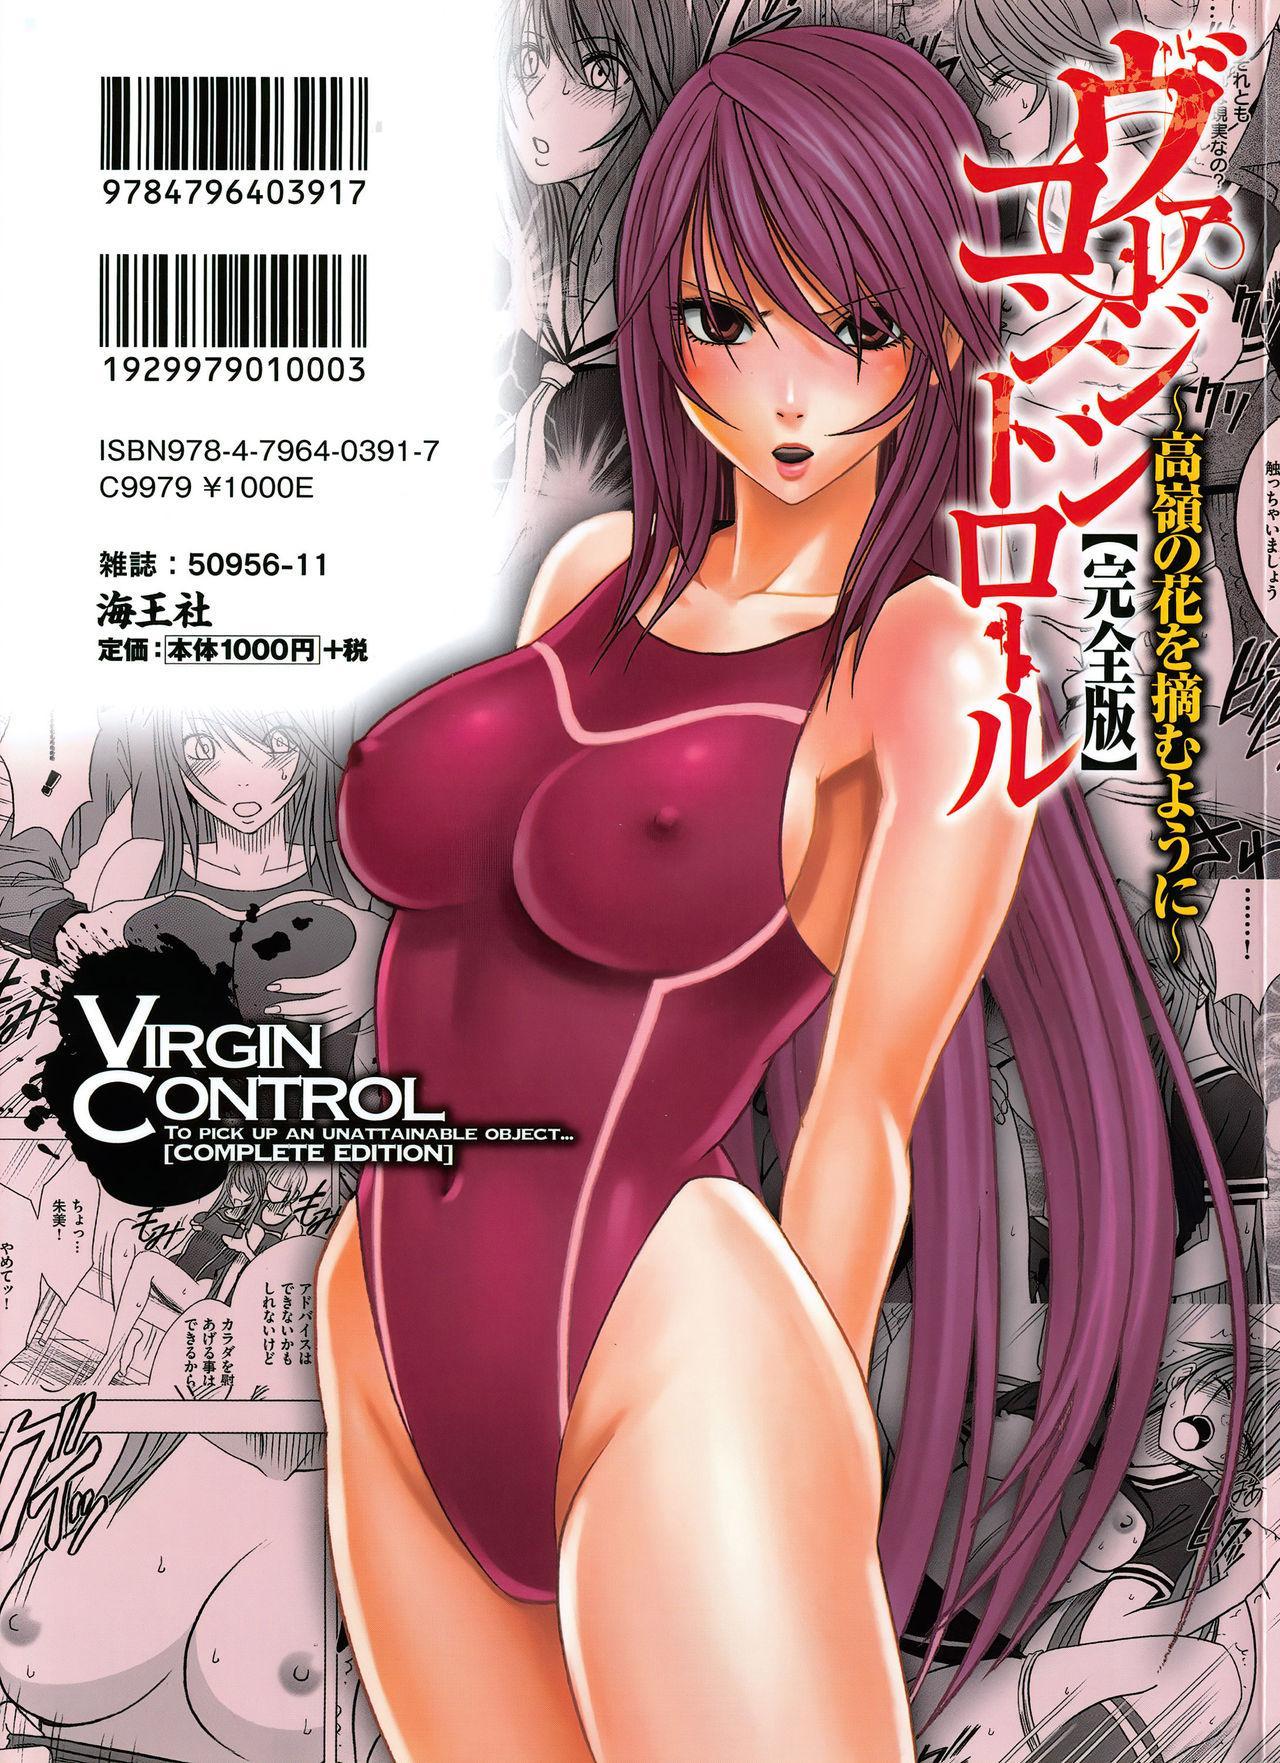 Virgin Control 215